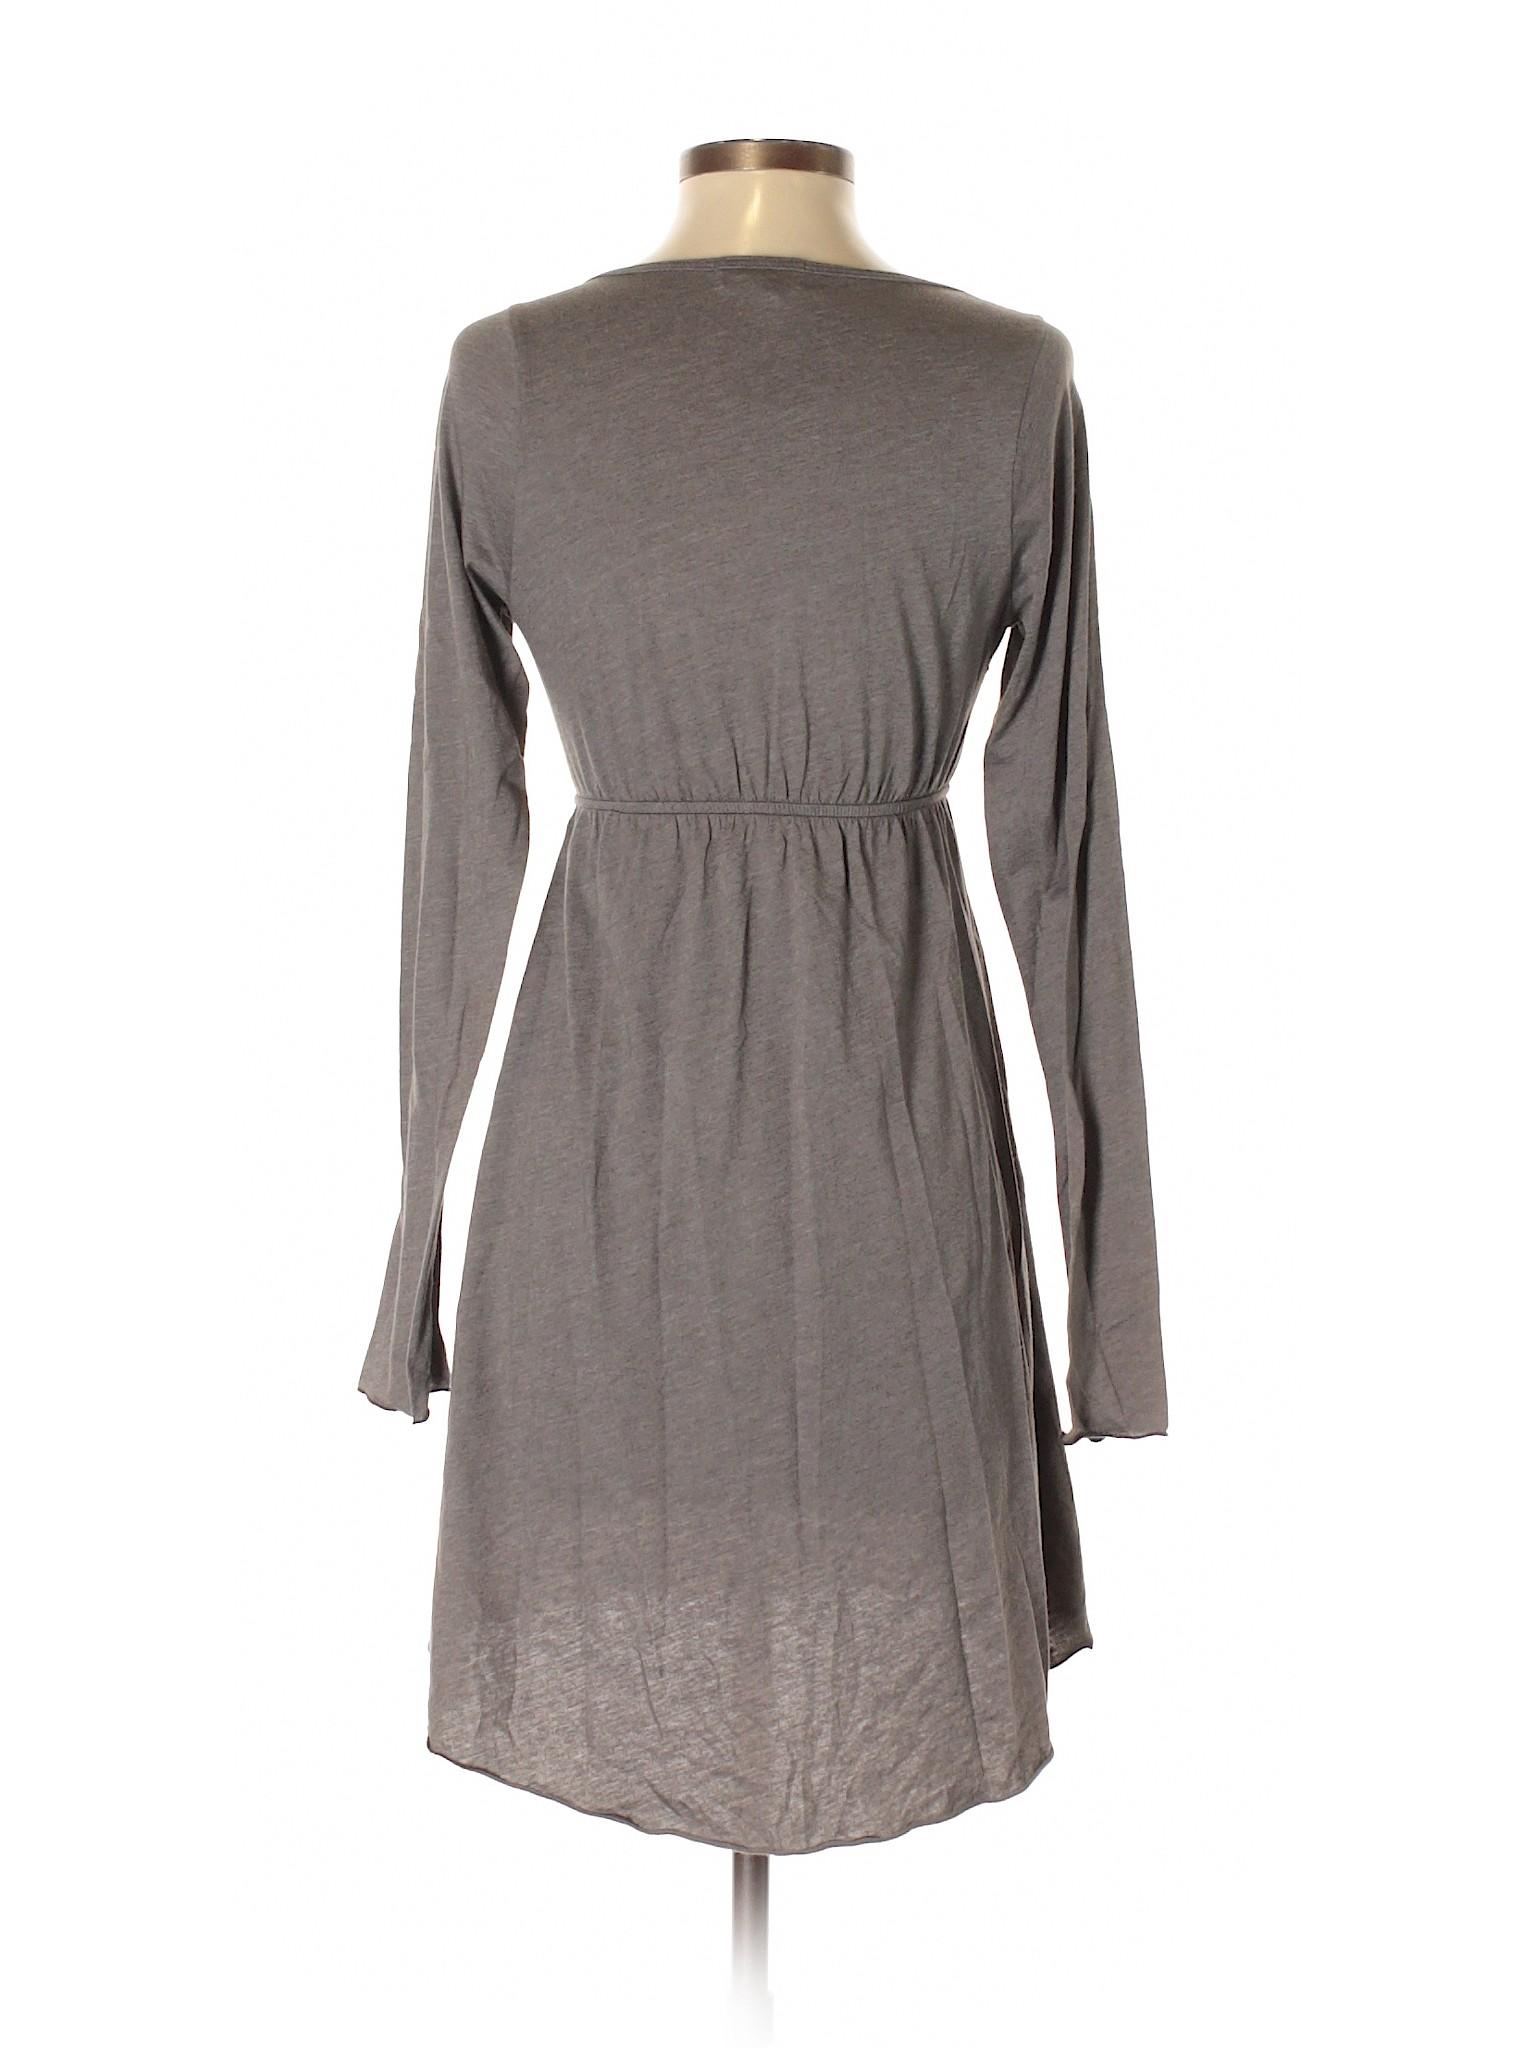 Selling Dress Dress Casual Selling Puella Puella Selling Casual Puella Casual HqBxwvEq